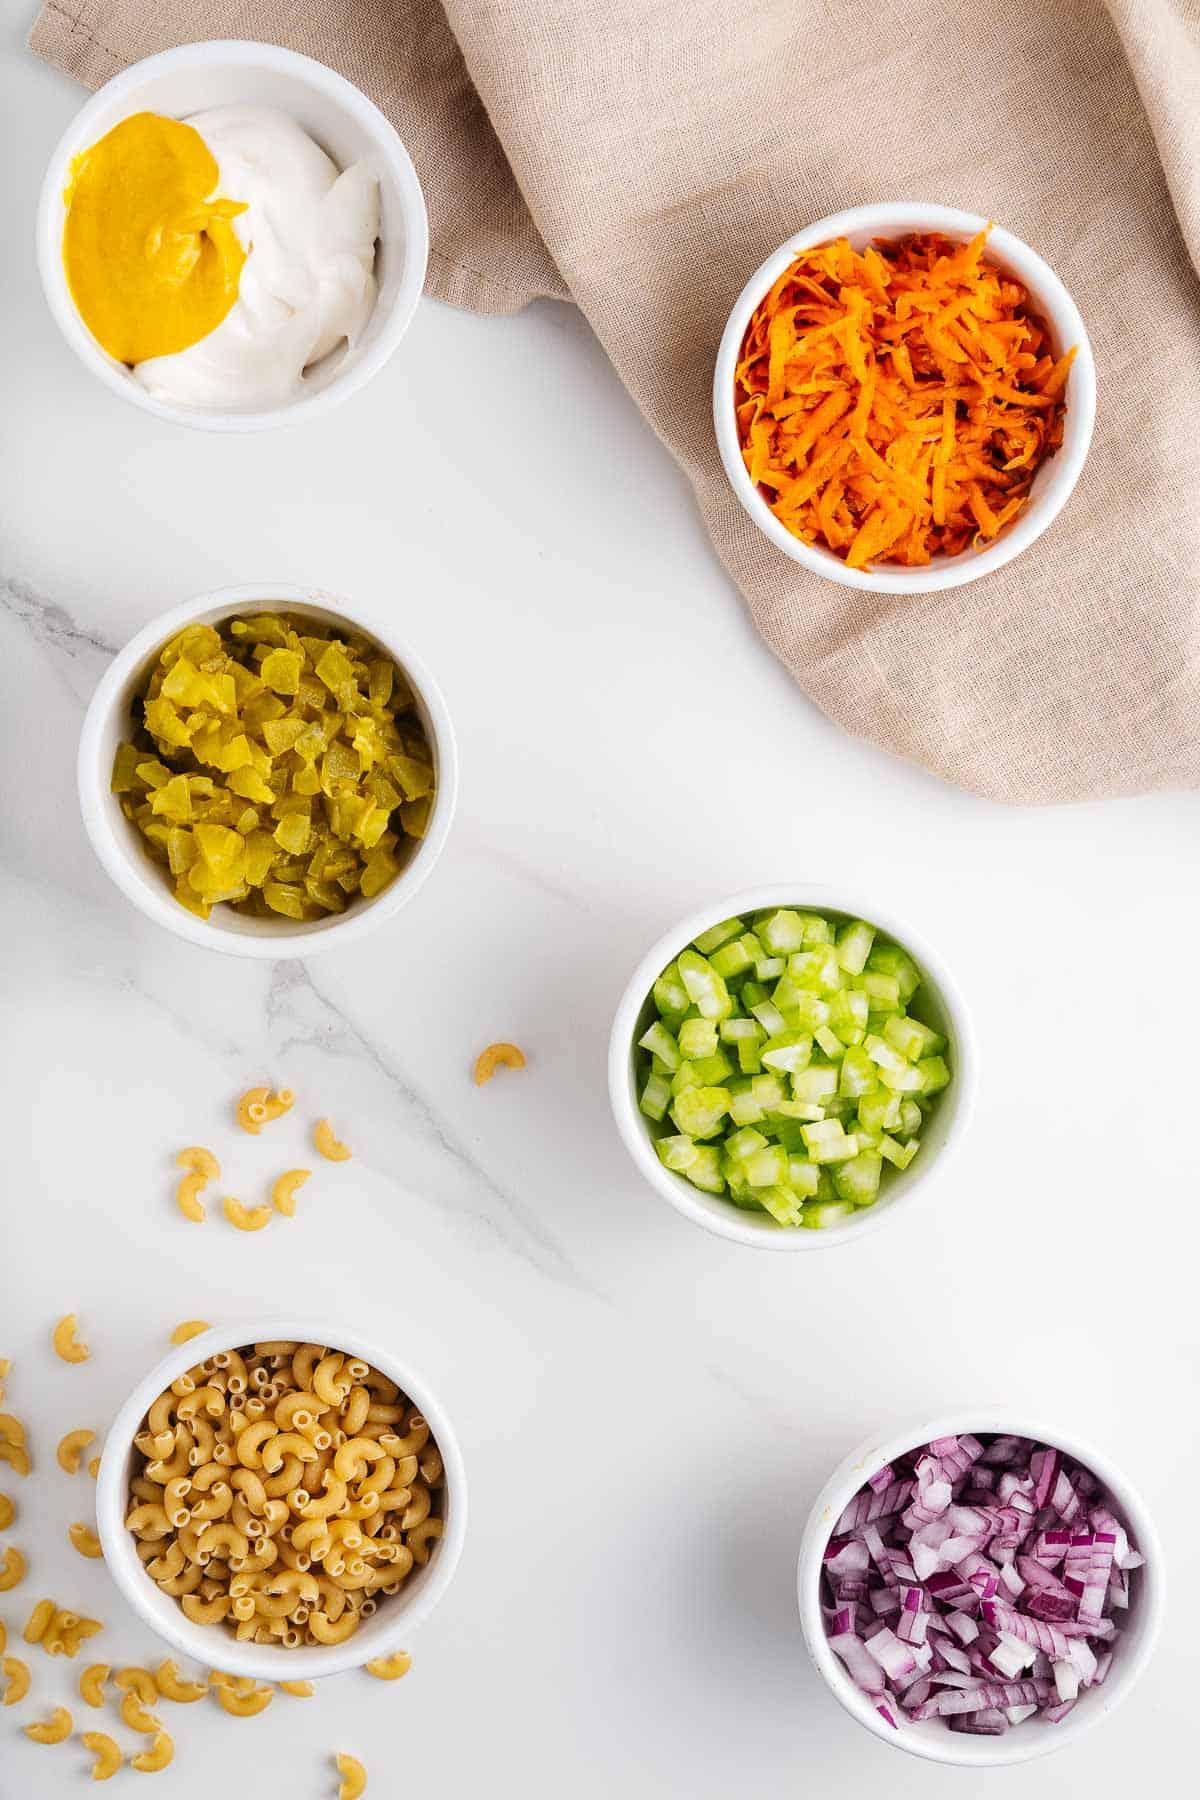 Vegan Mayo, Mustard, Crema, Pickles, Carrots, Red Onion, Celery, and Macaroni